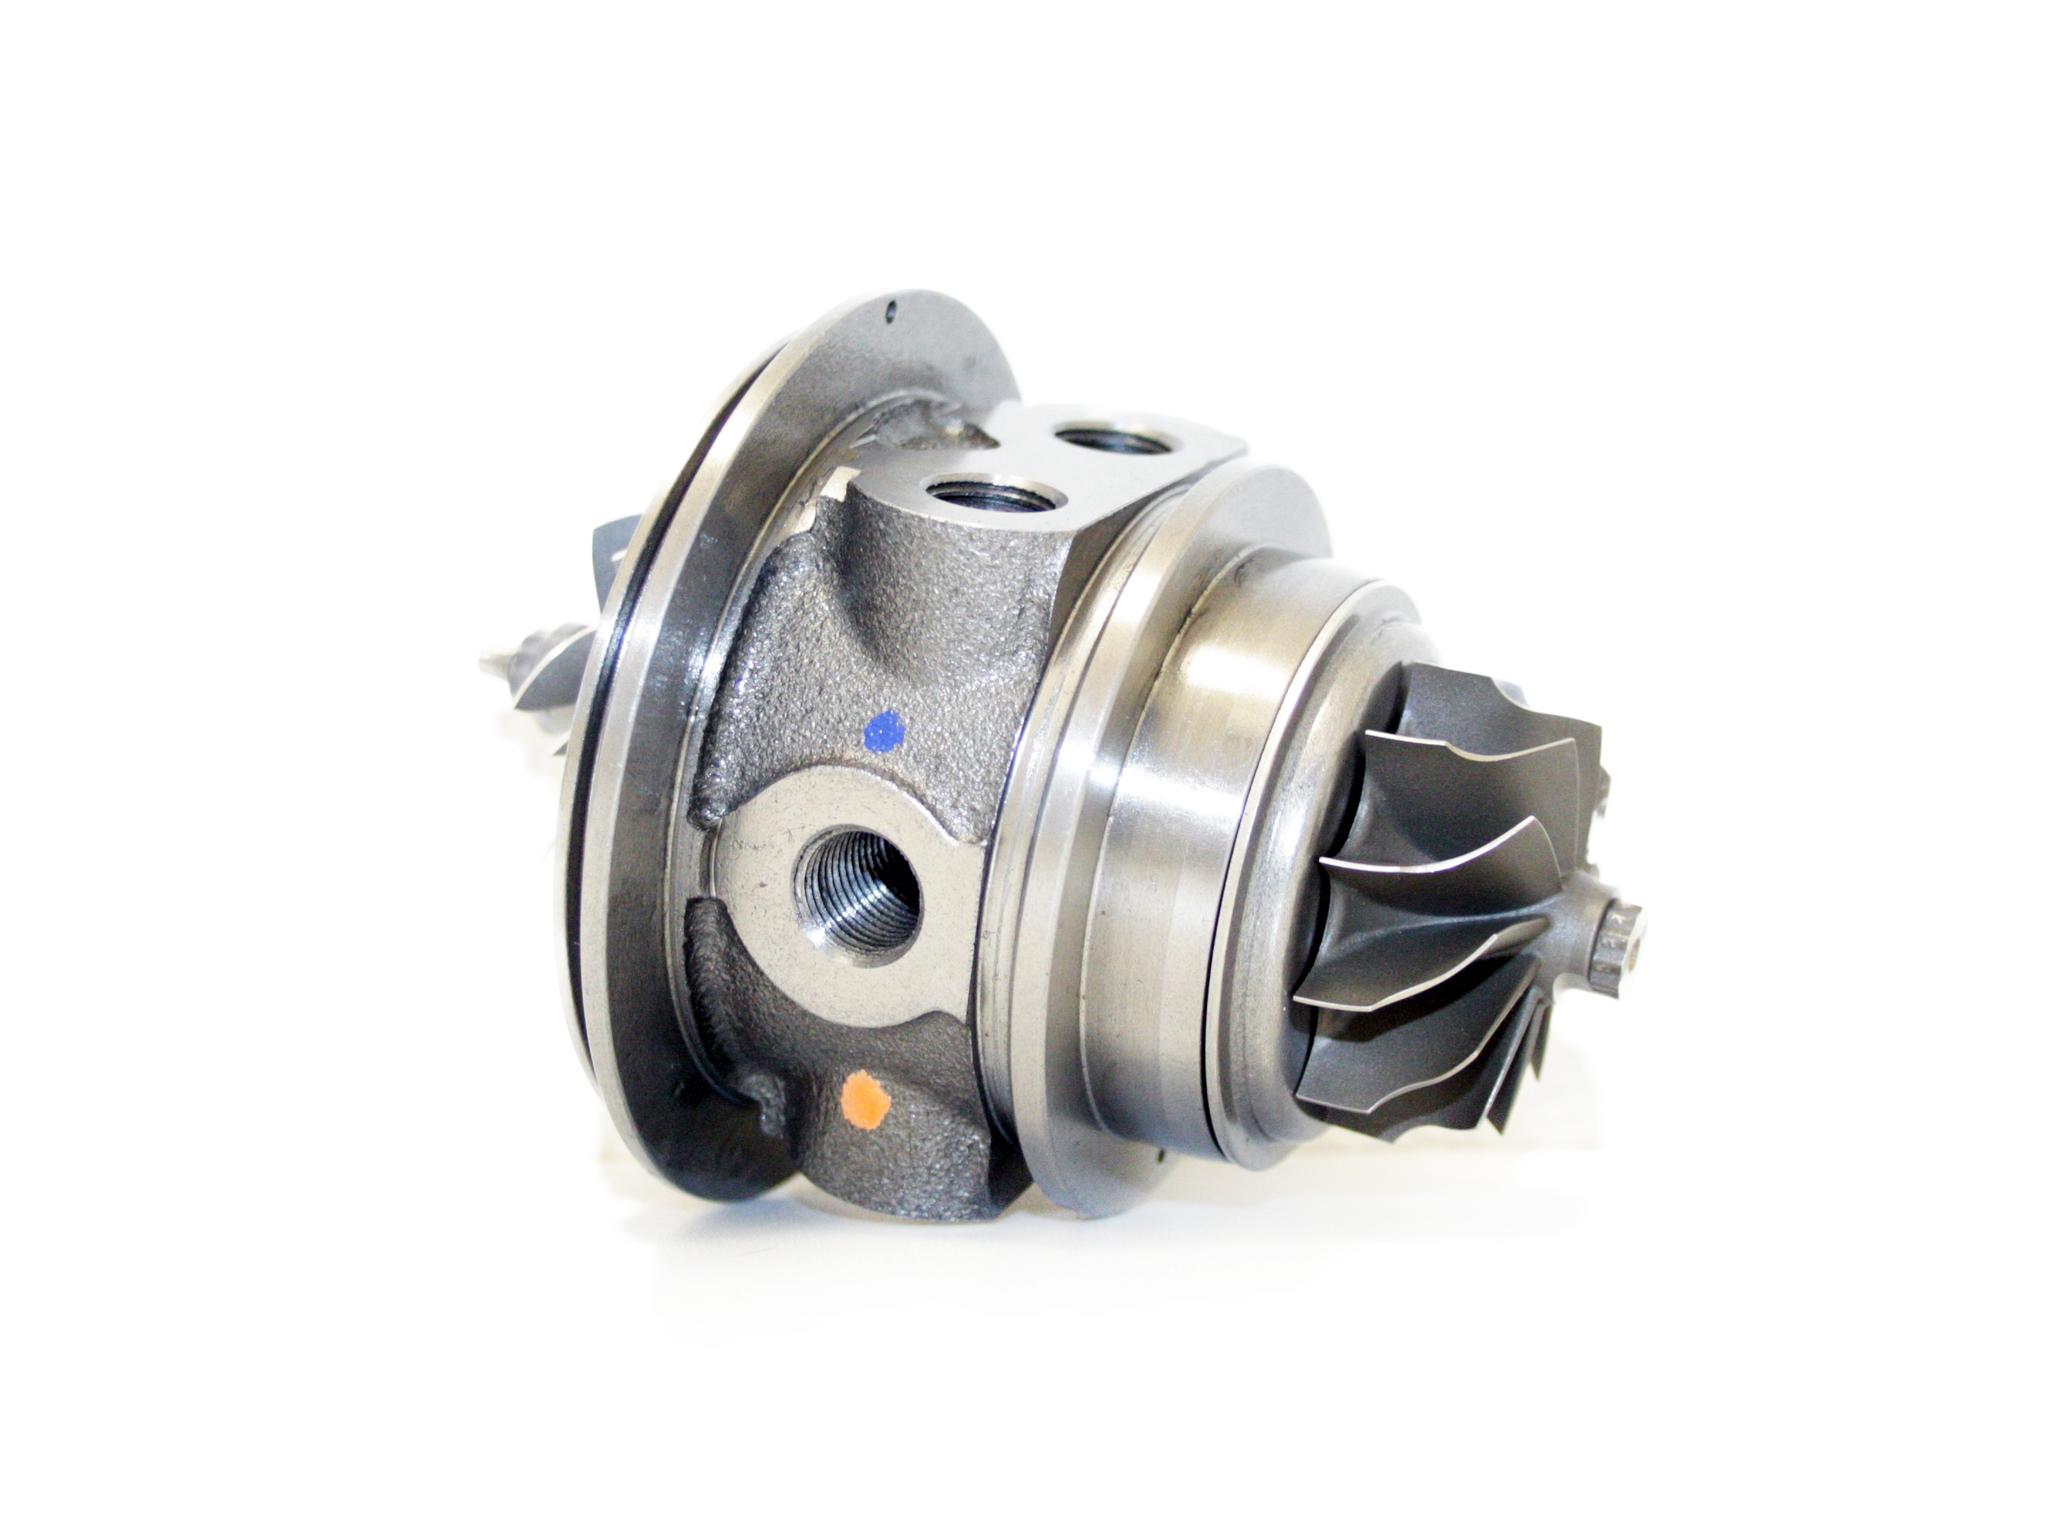 Картридж турбины TF035HL8 Ниссан Жук 1.6 MR16DDT 190, 200 л.с.